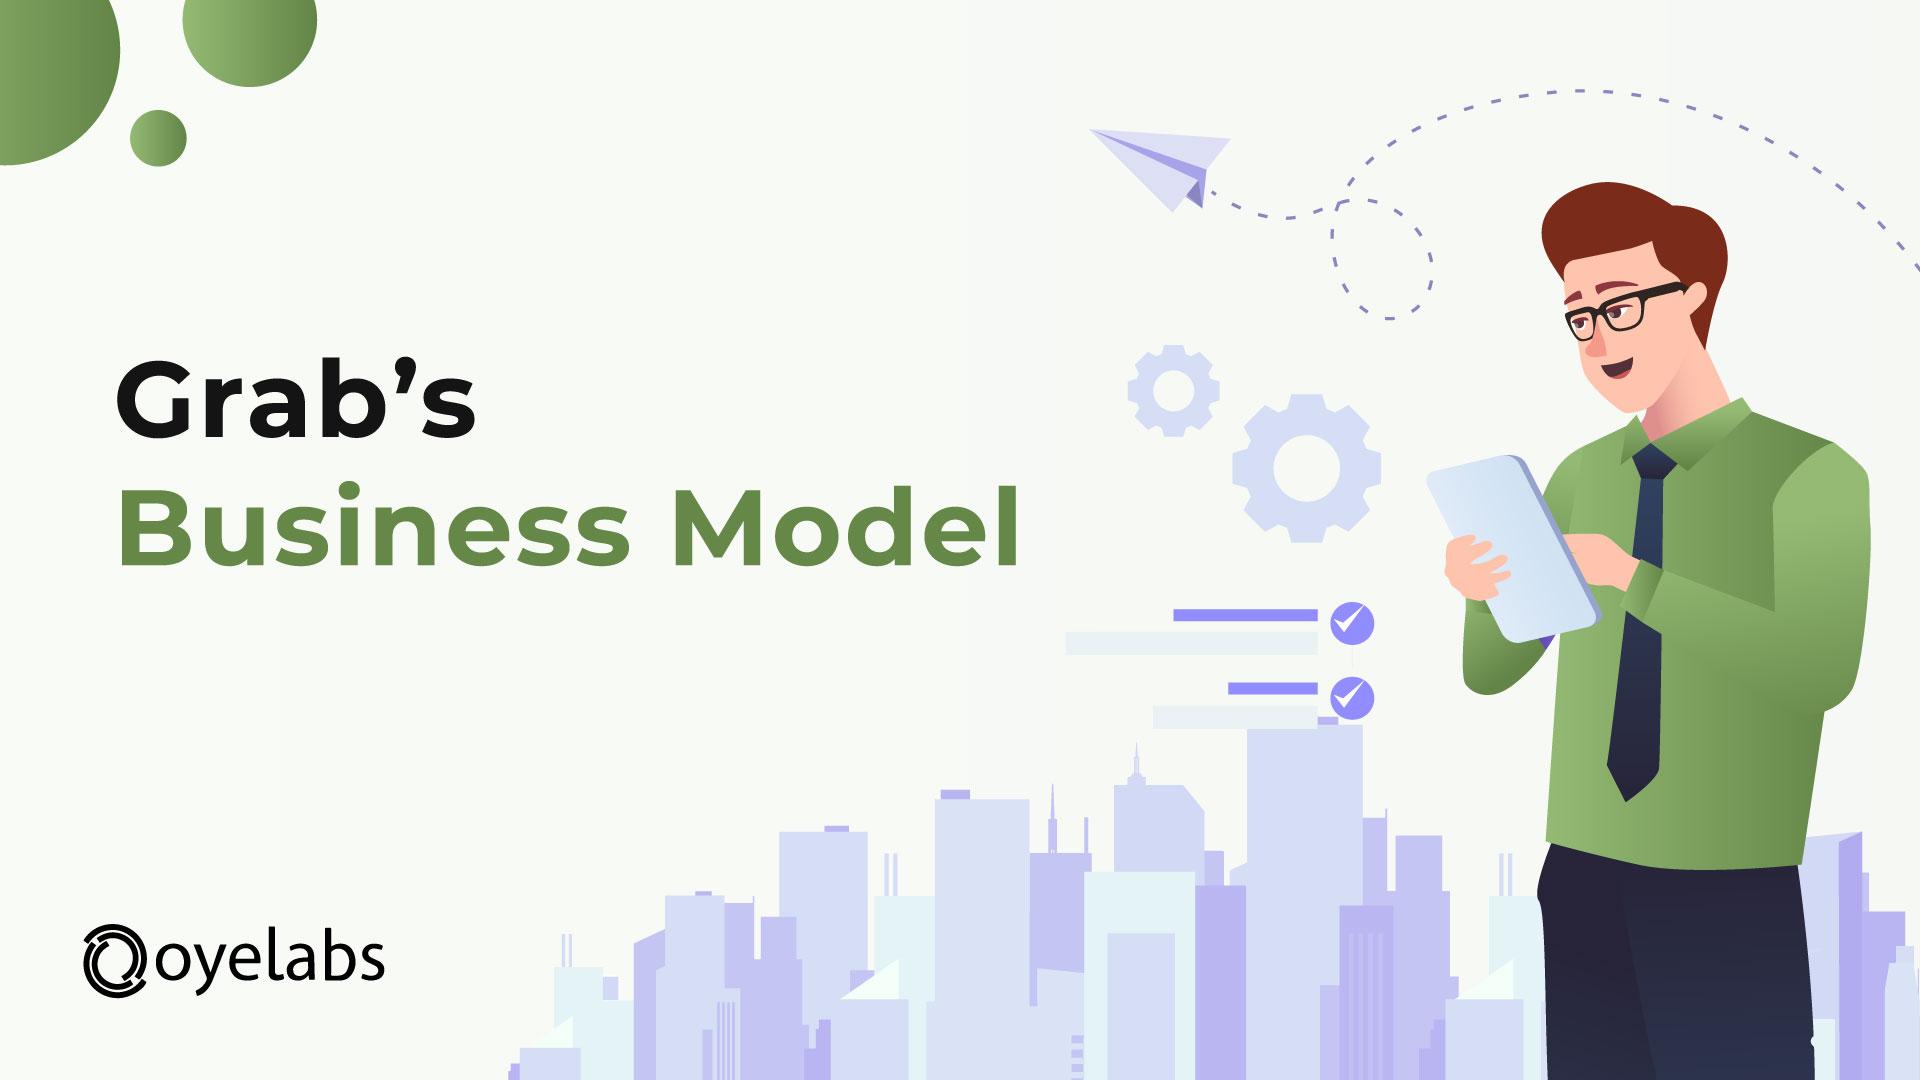 Business Model Of an App Like Grab